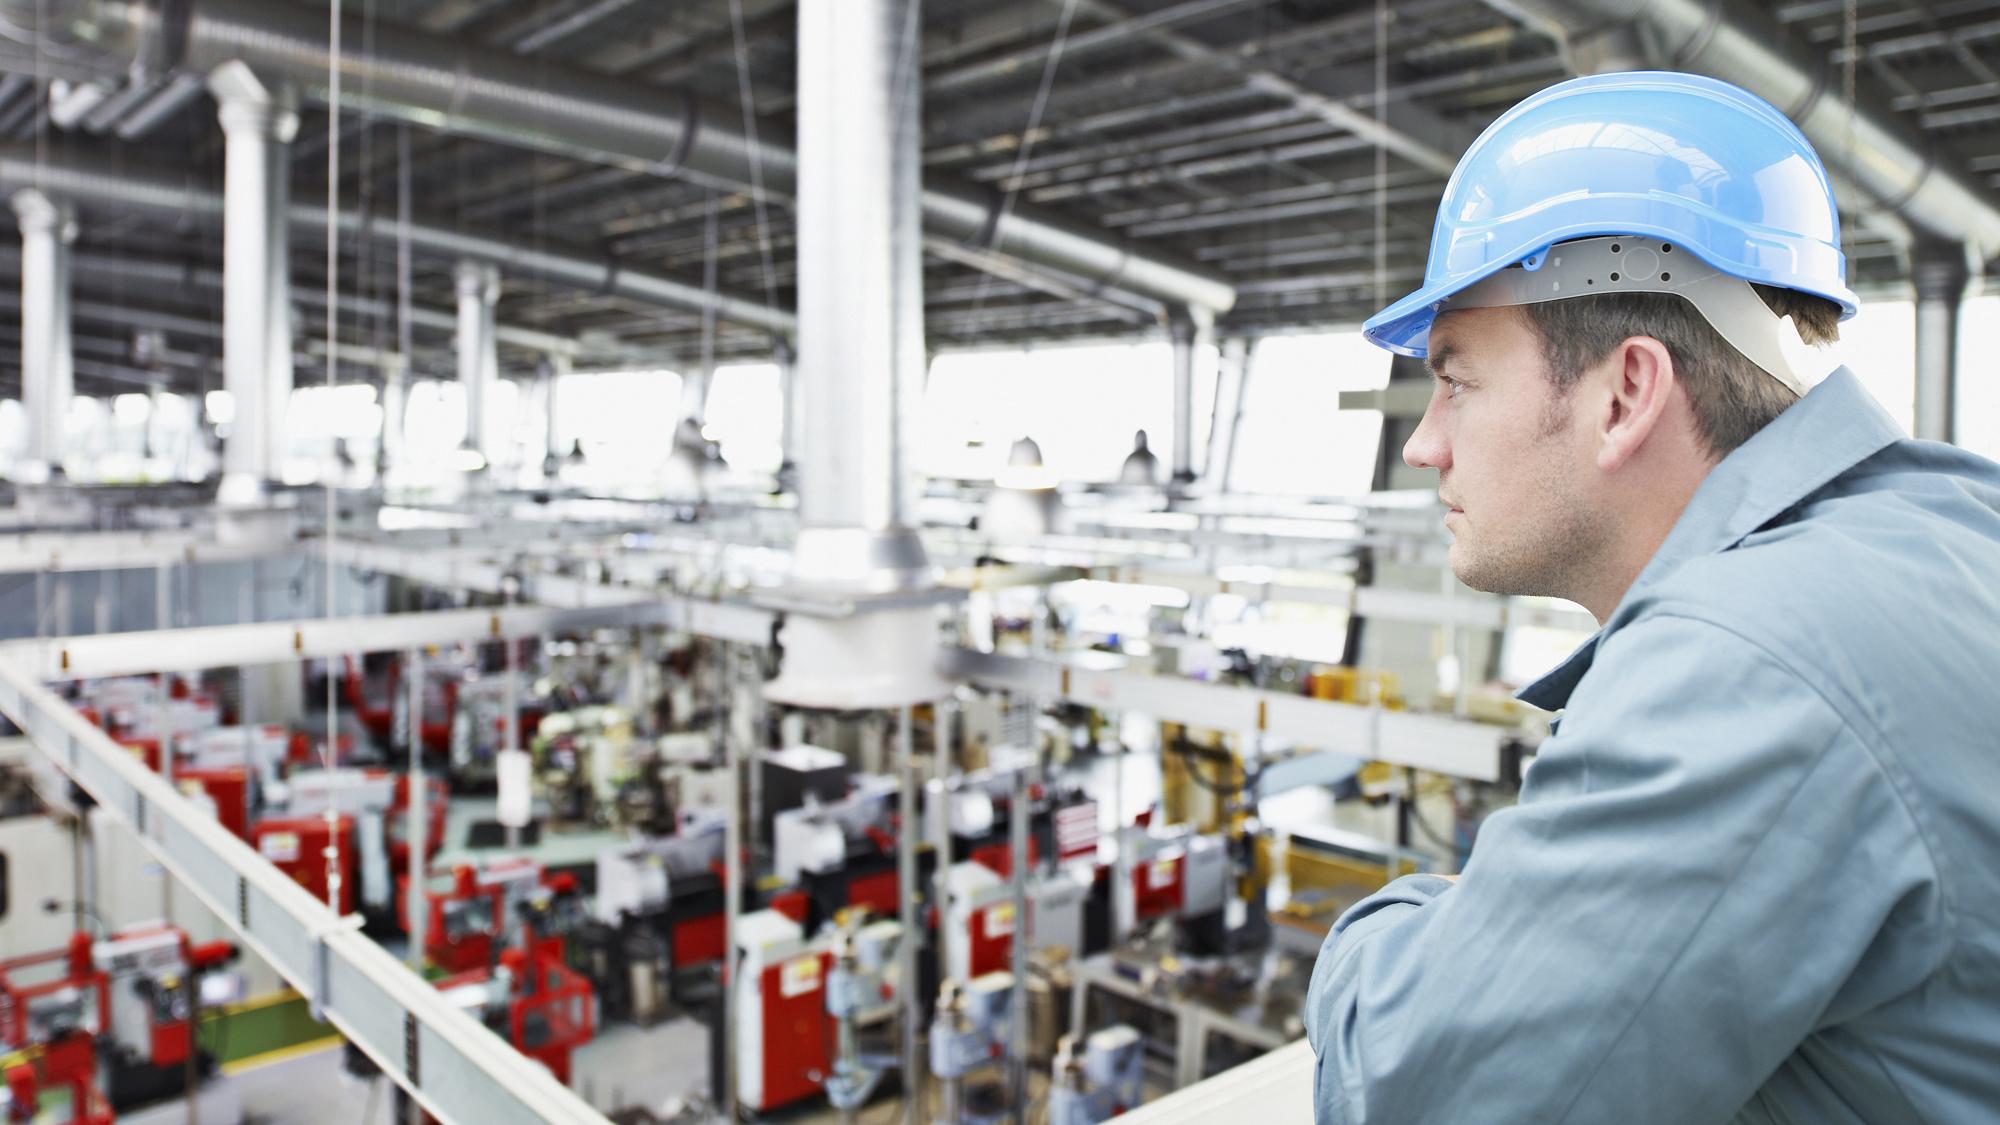 Image of worker overseeing factory work